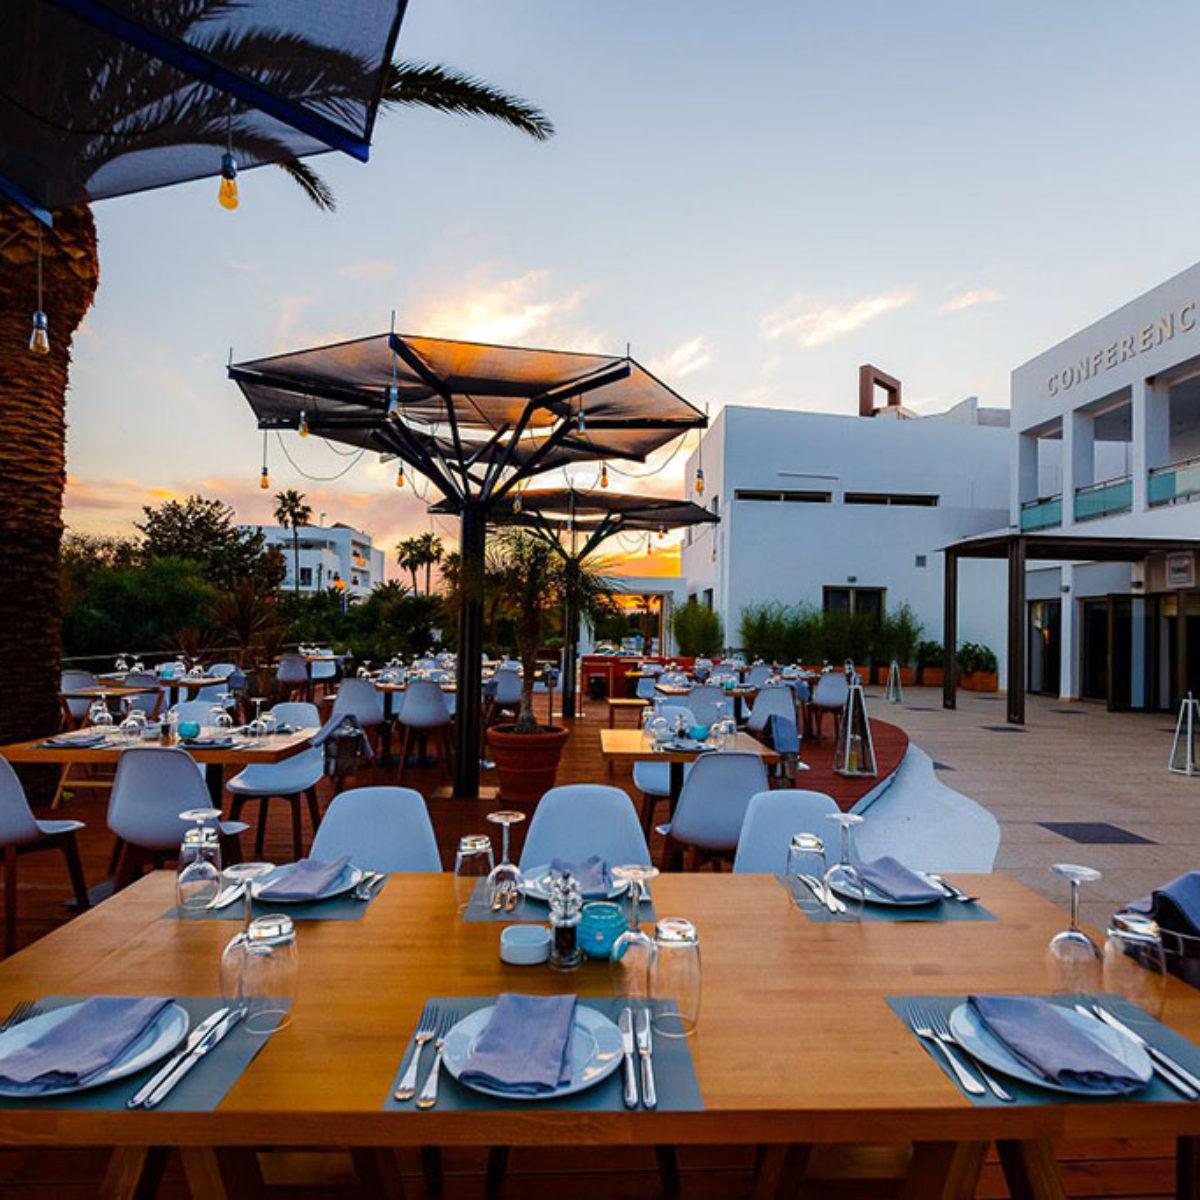 Yiamas Gastro Bar - Καλαμάτα - Μοντέρνα Ευρωπαϊκή Κουζίνα - Για εμάς